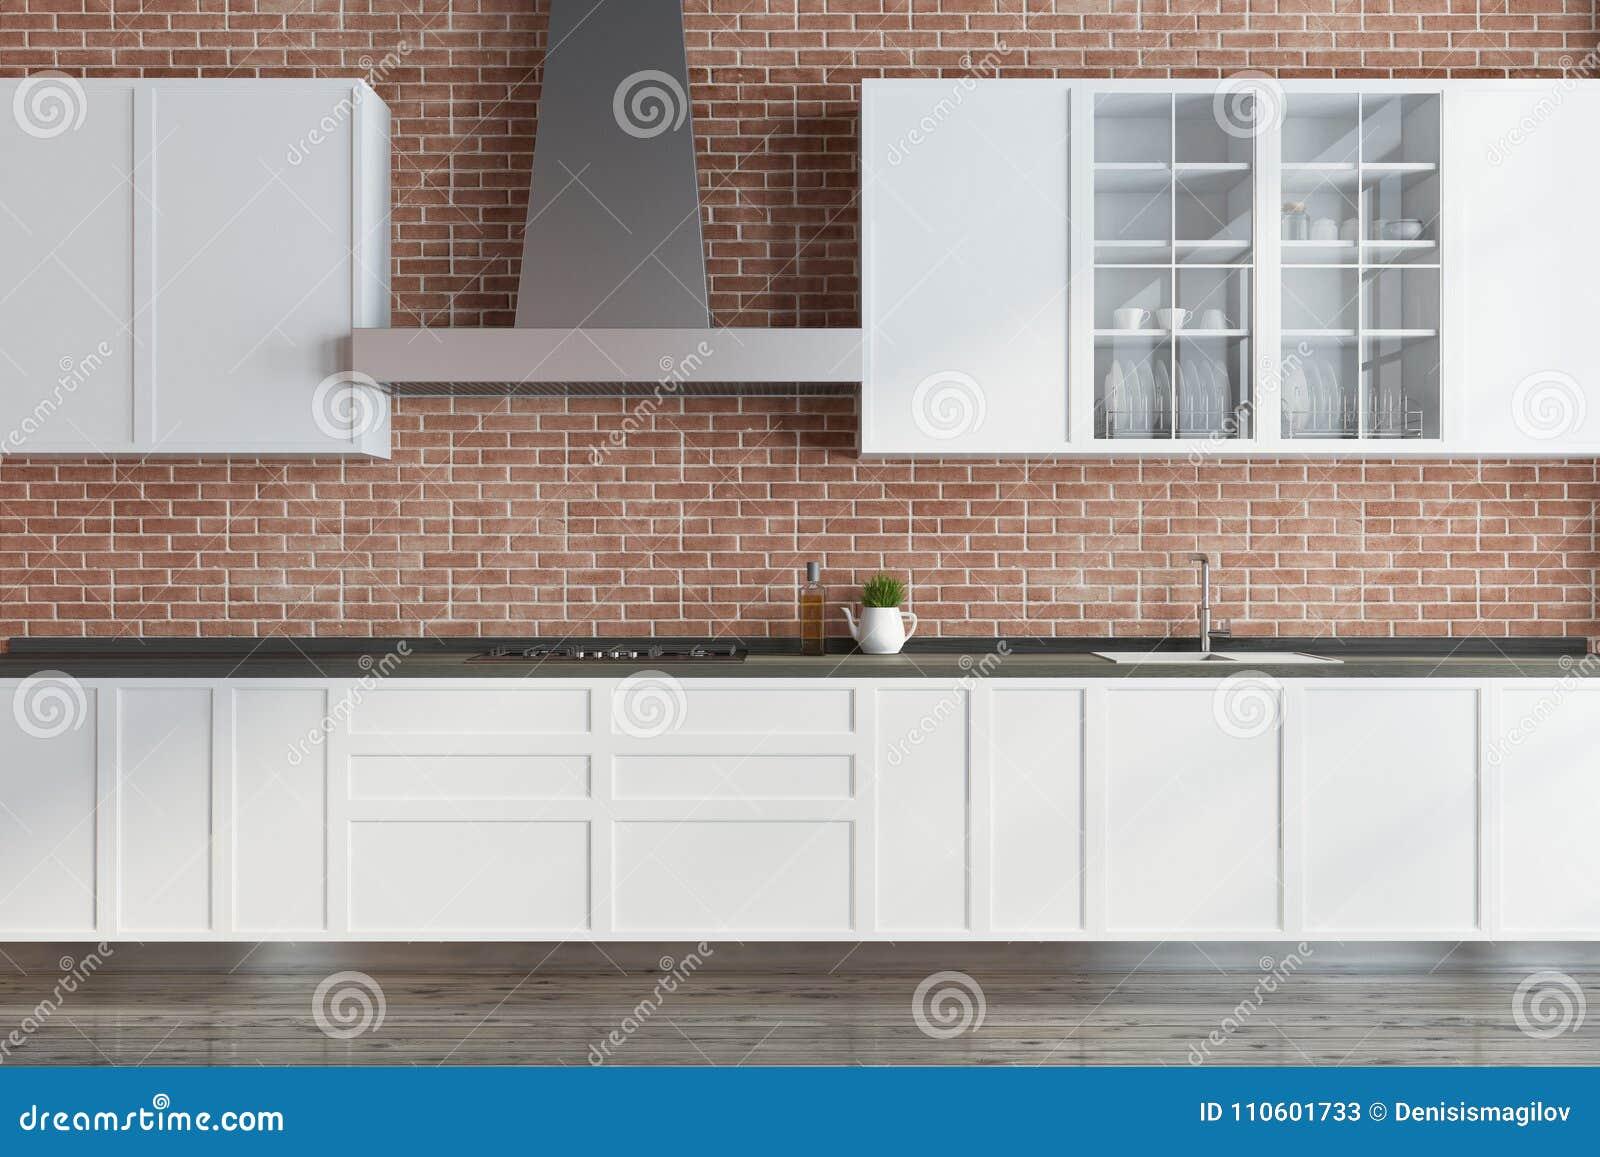 Download Modern Brick Kitchen, White Countertops Stock Illustration    Illustration Of House, Prestige: